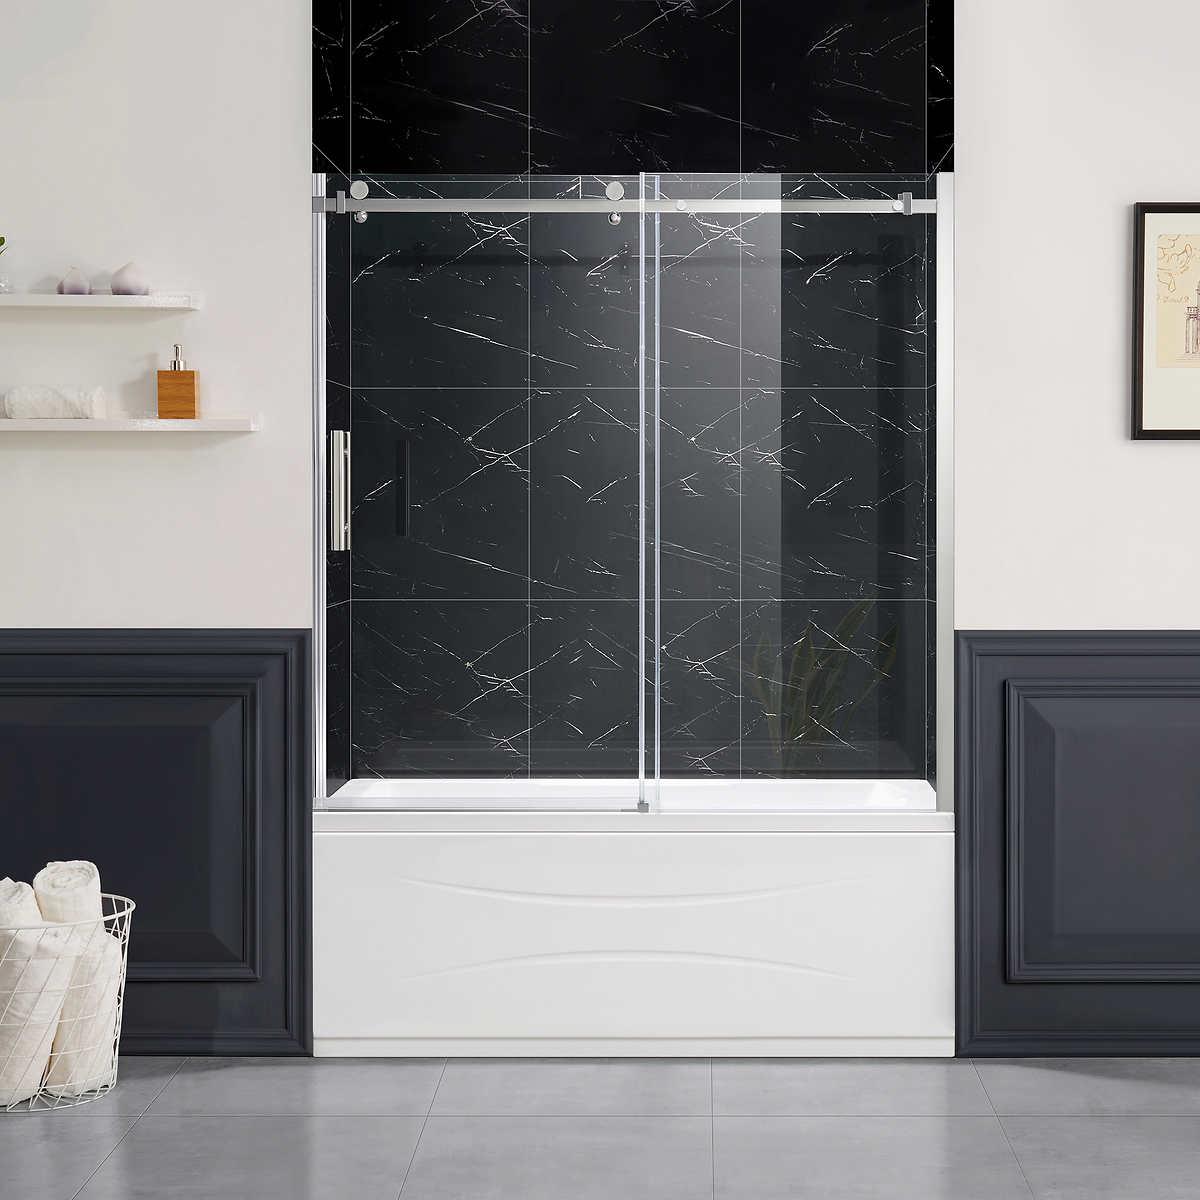 Bathroom Sliding Glass Shower Doors.Park 60 Tub Sliding Glass Door By Ove